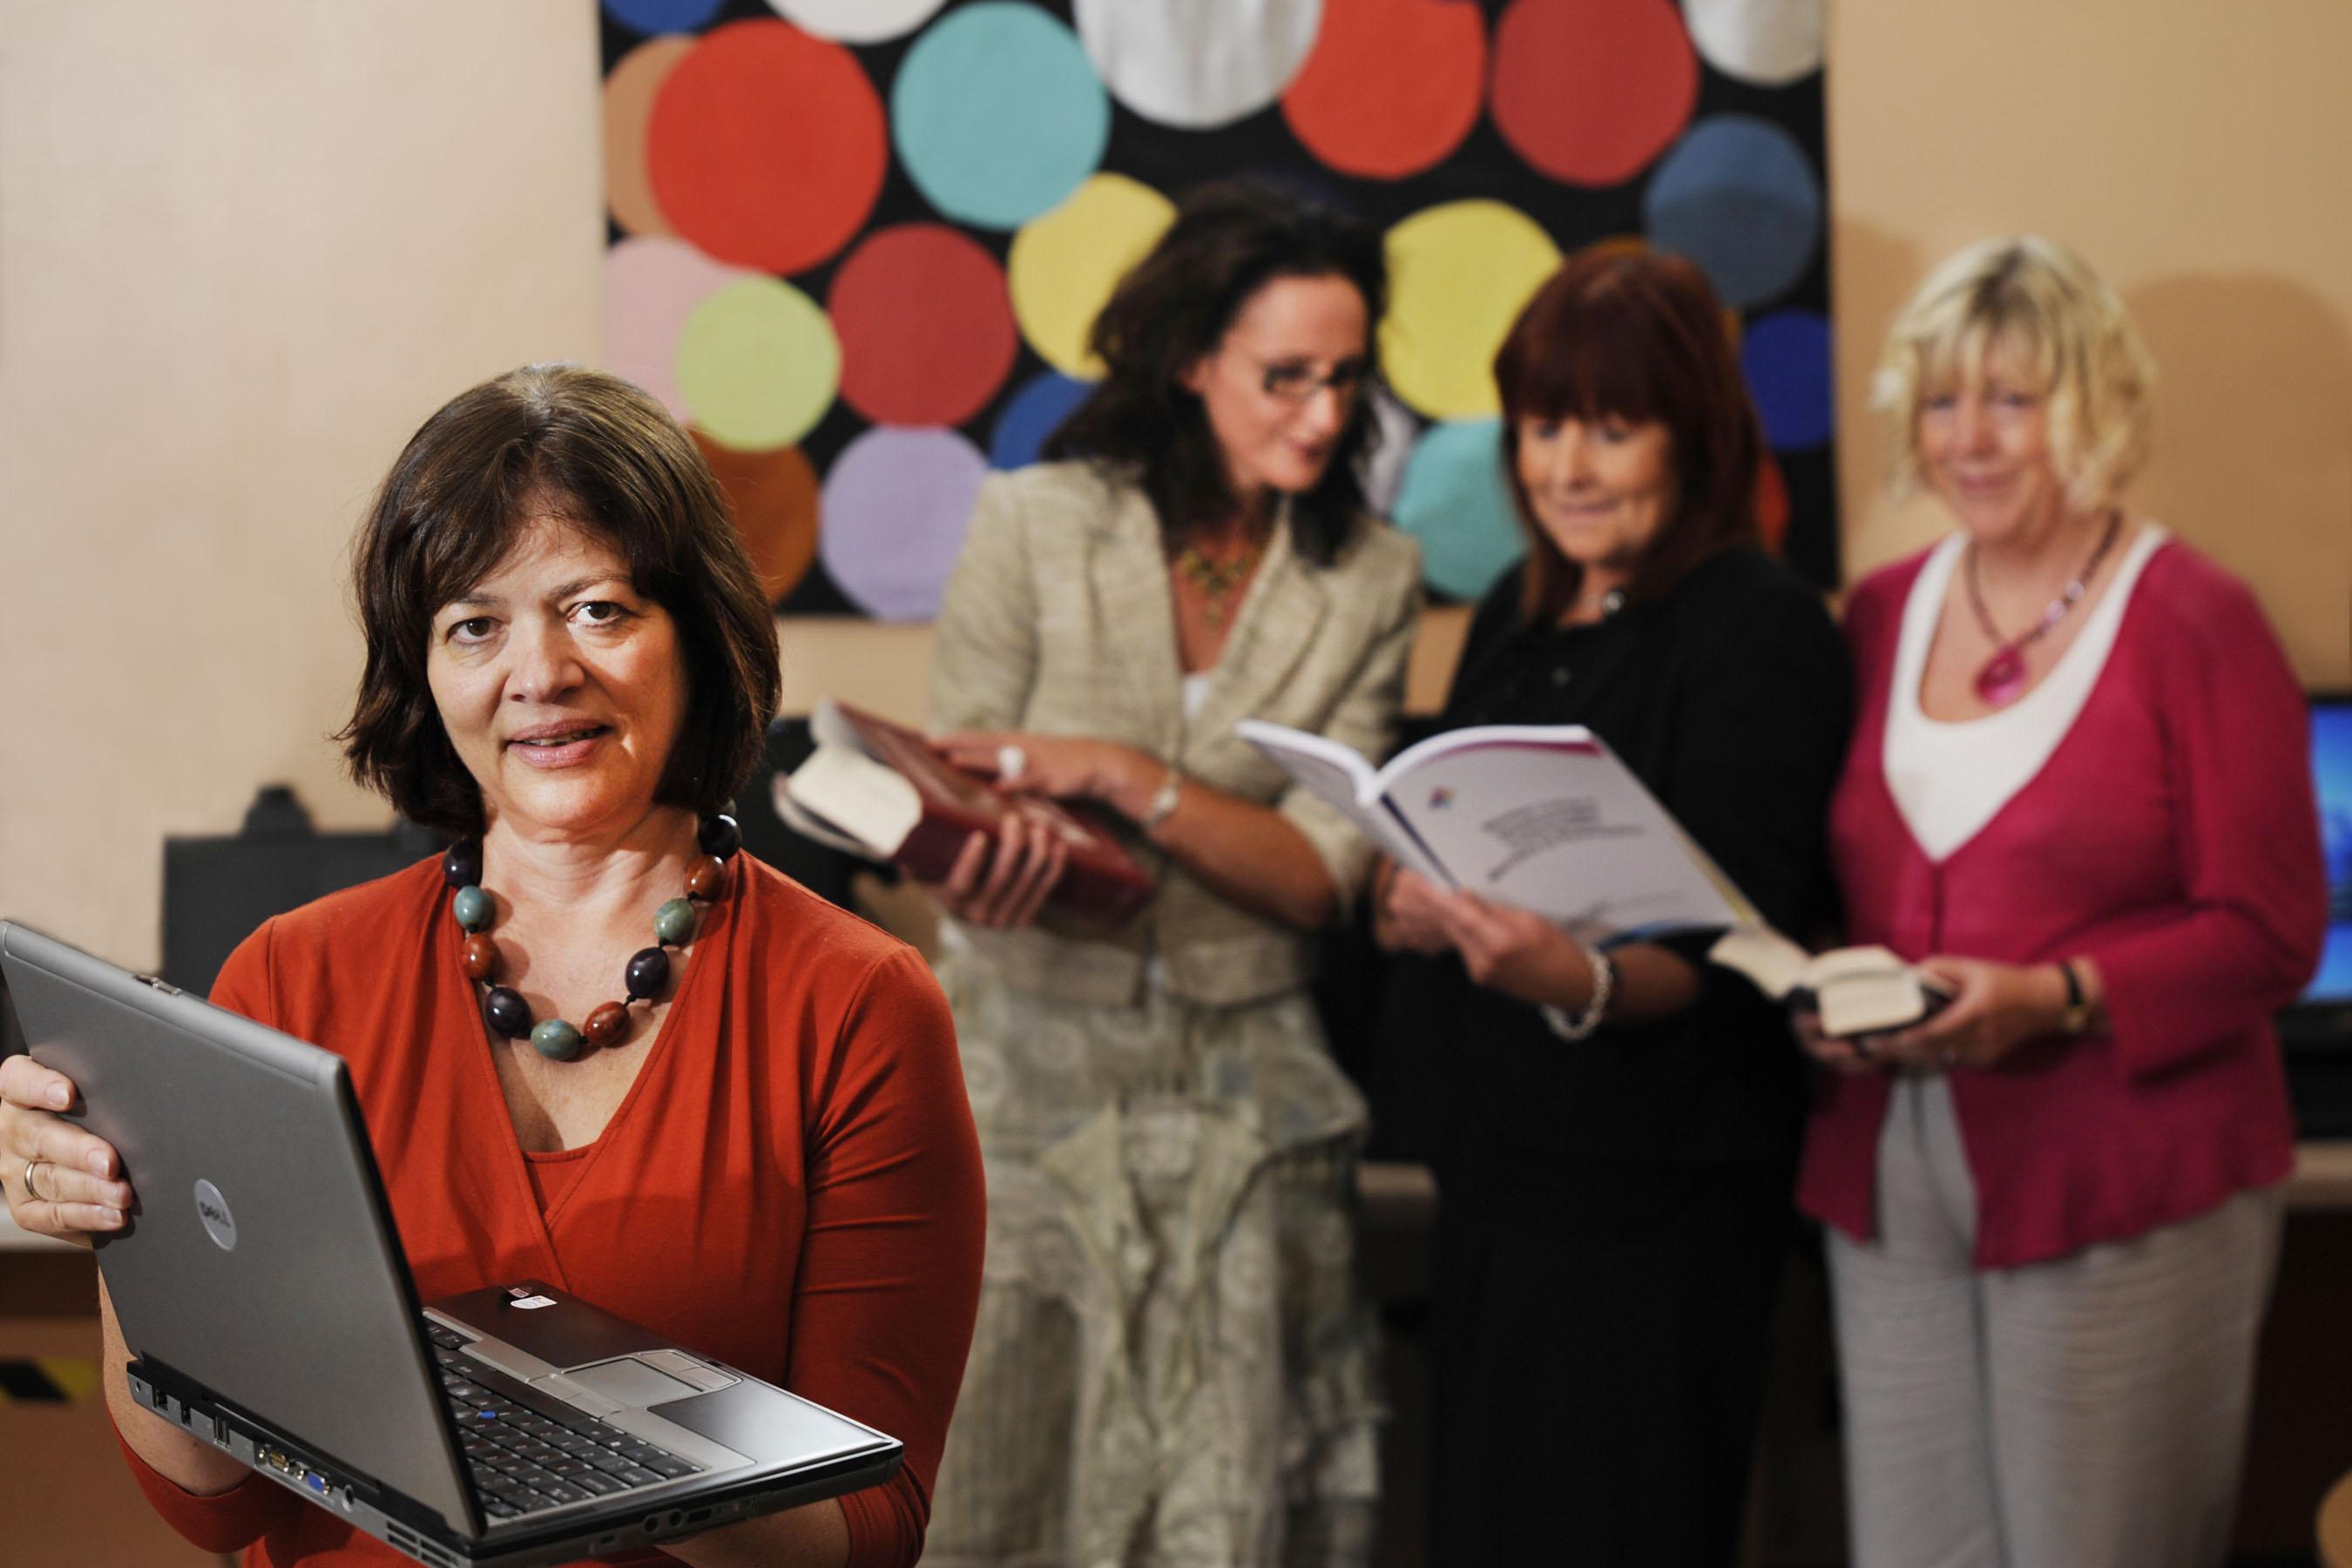 New website provides educational opportunities for women